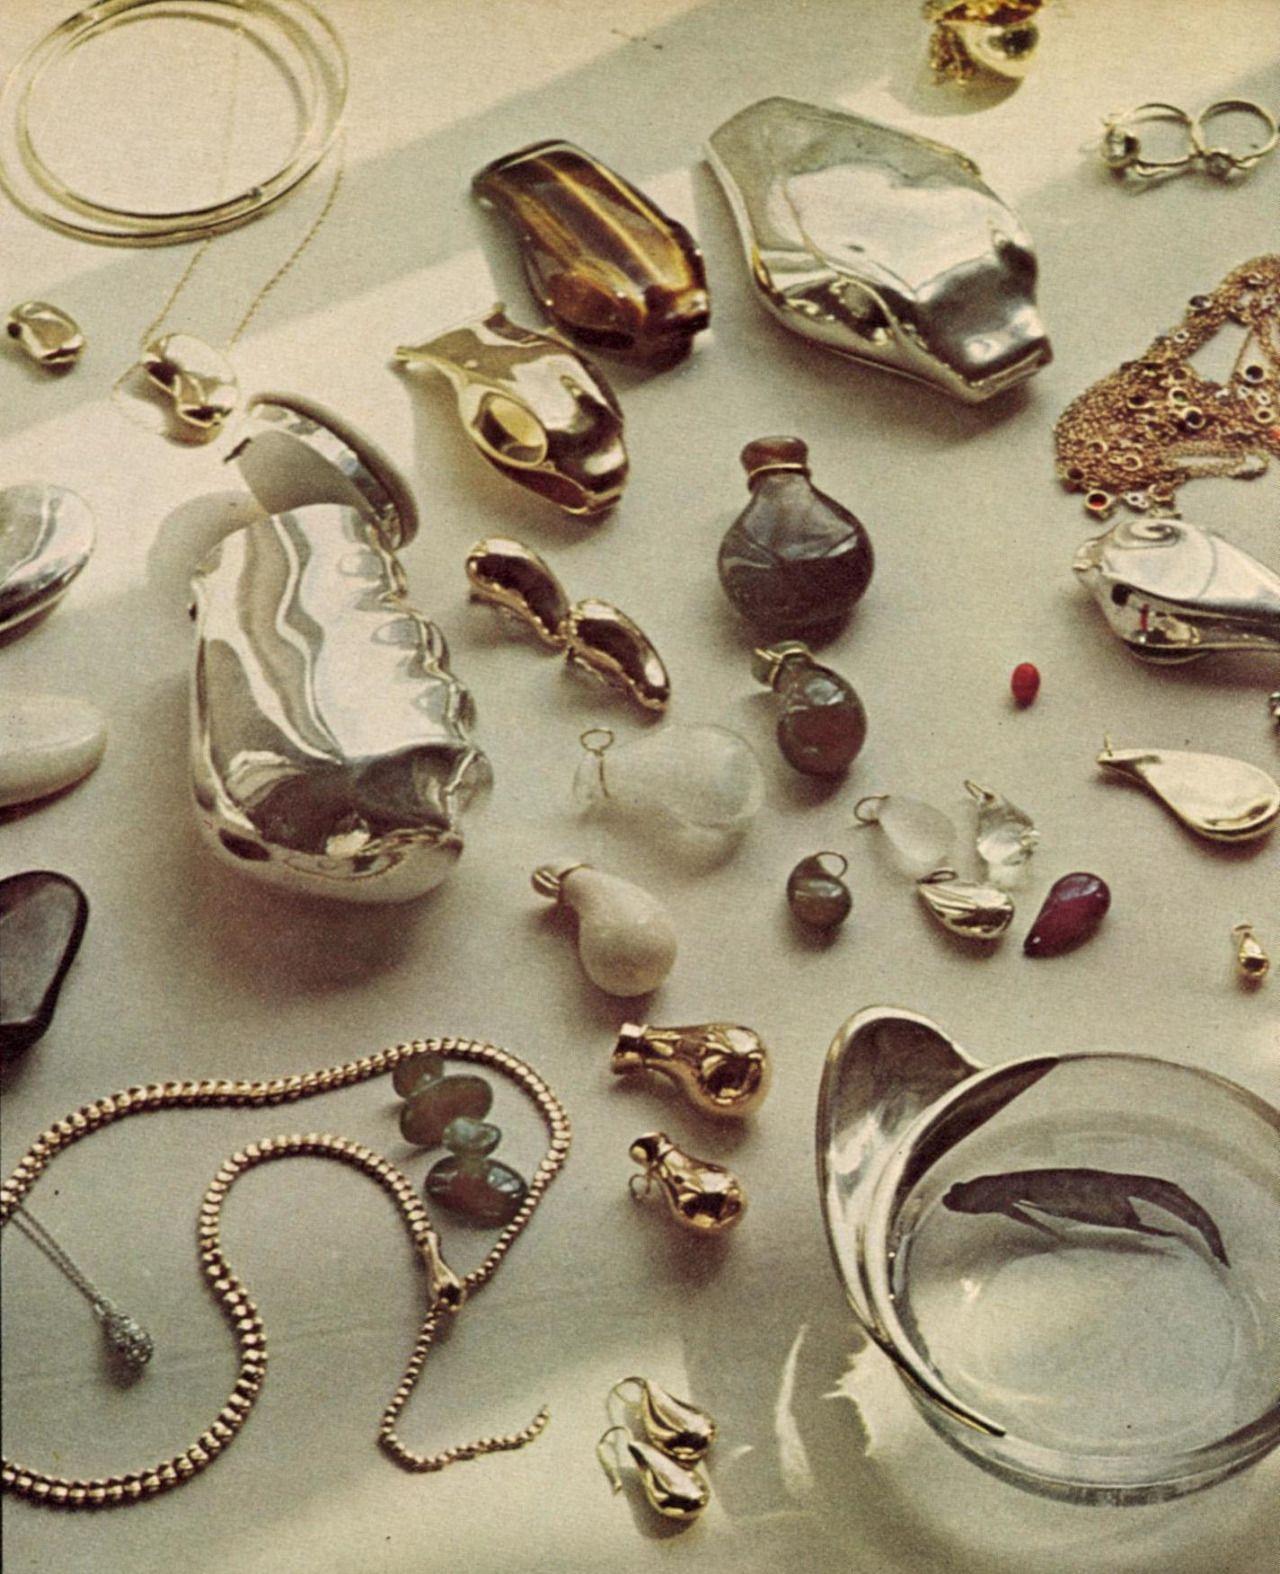 c70d62054 US Vogue December 1974 - Elsa Peretti   Things   Jewelry, Elsa ...